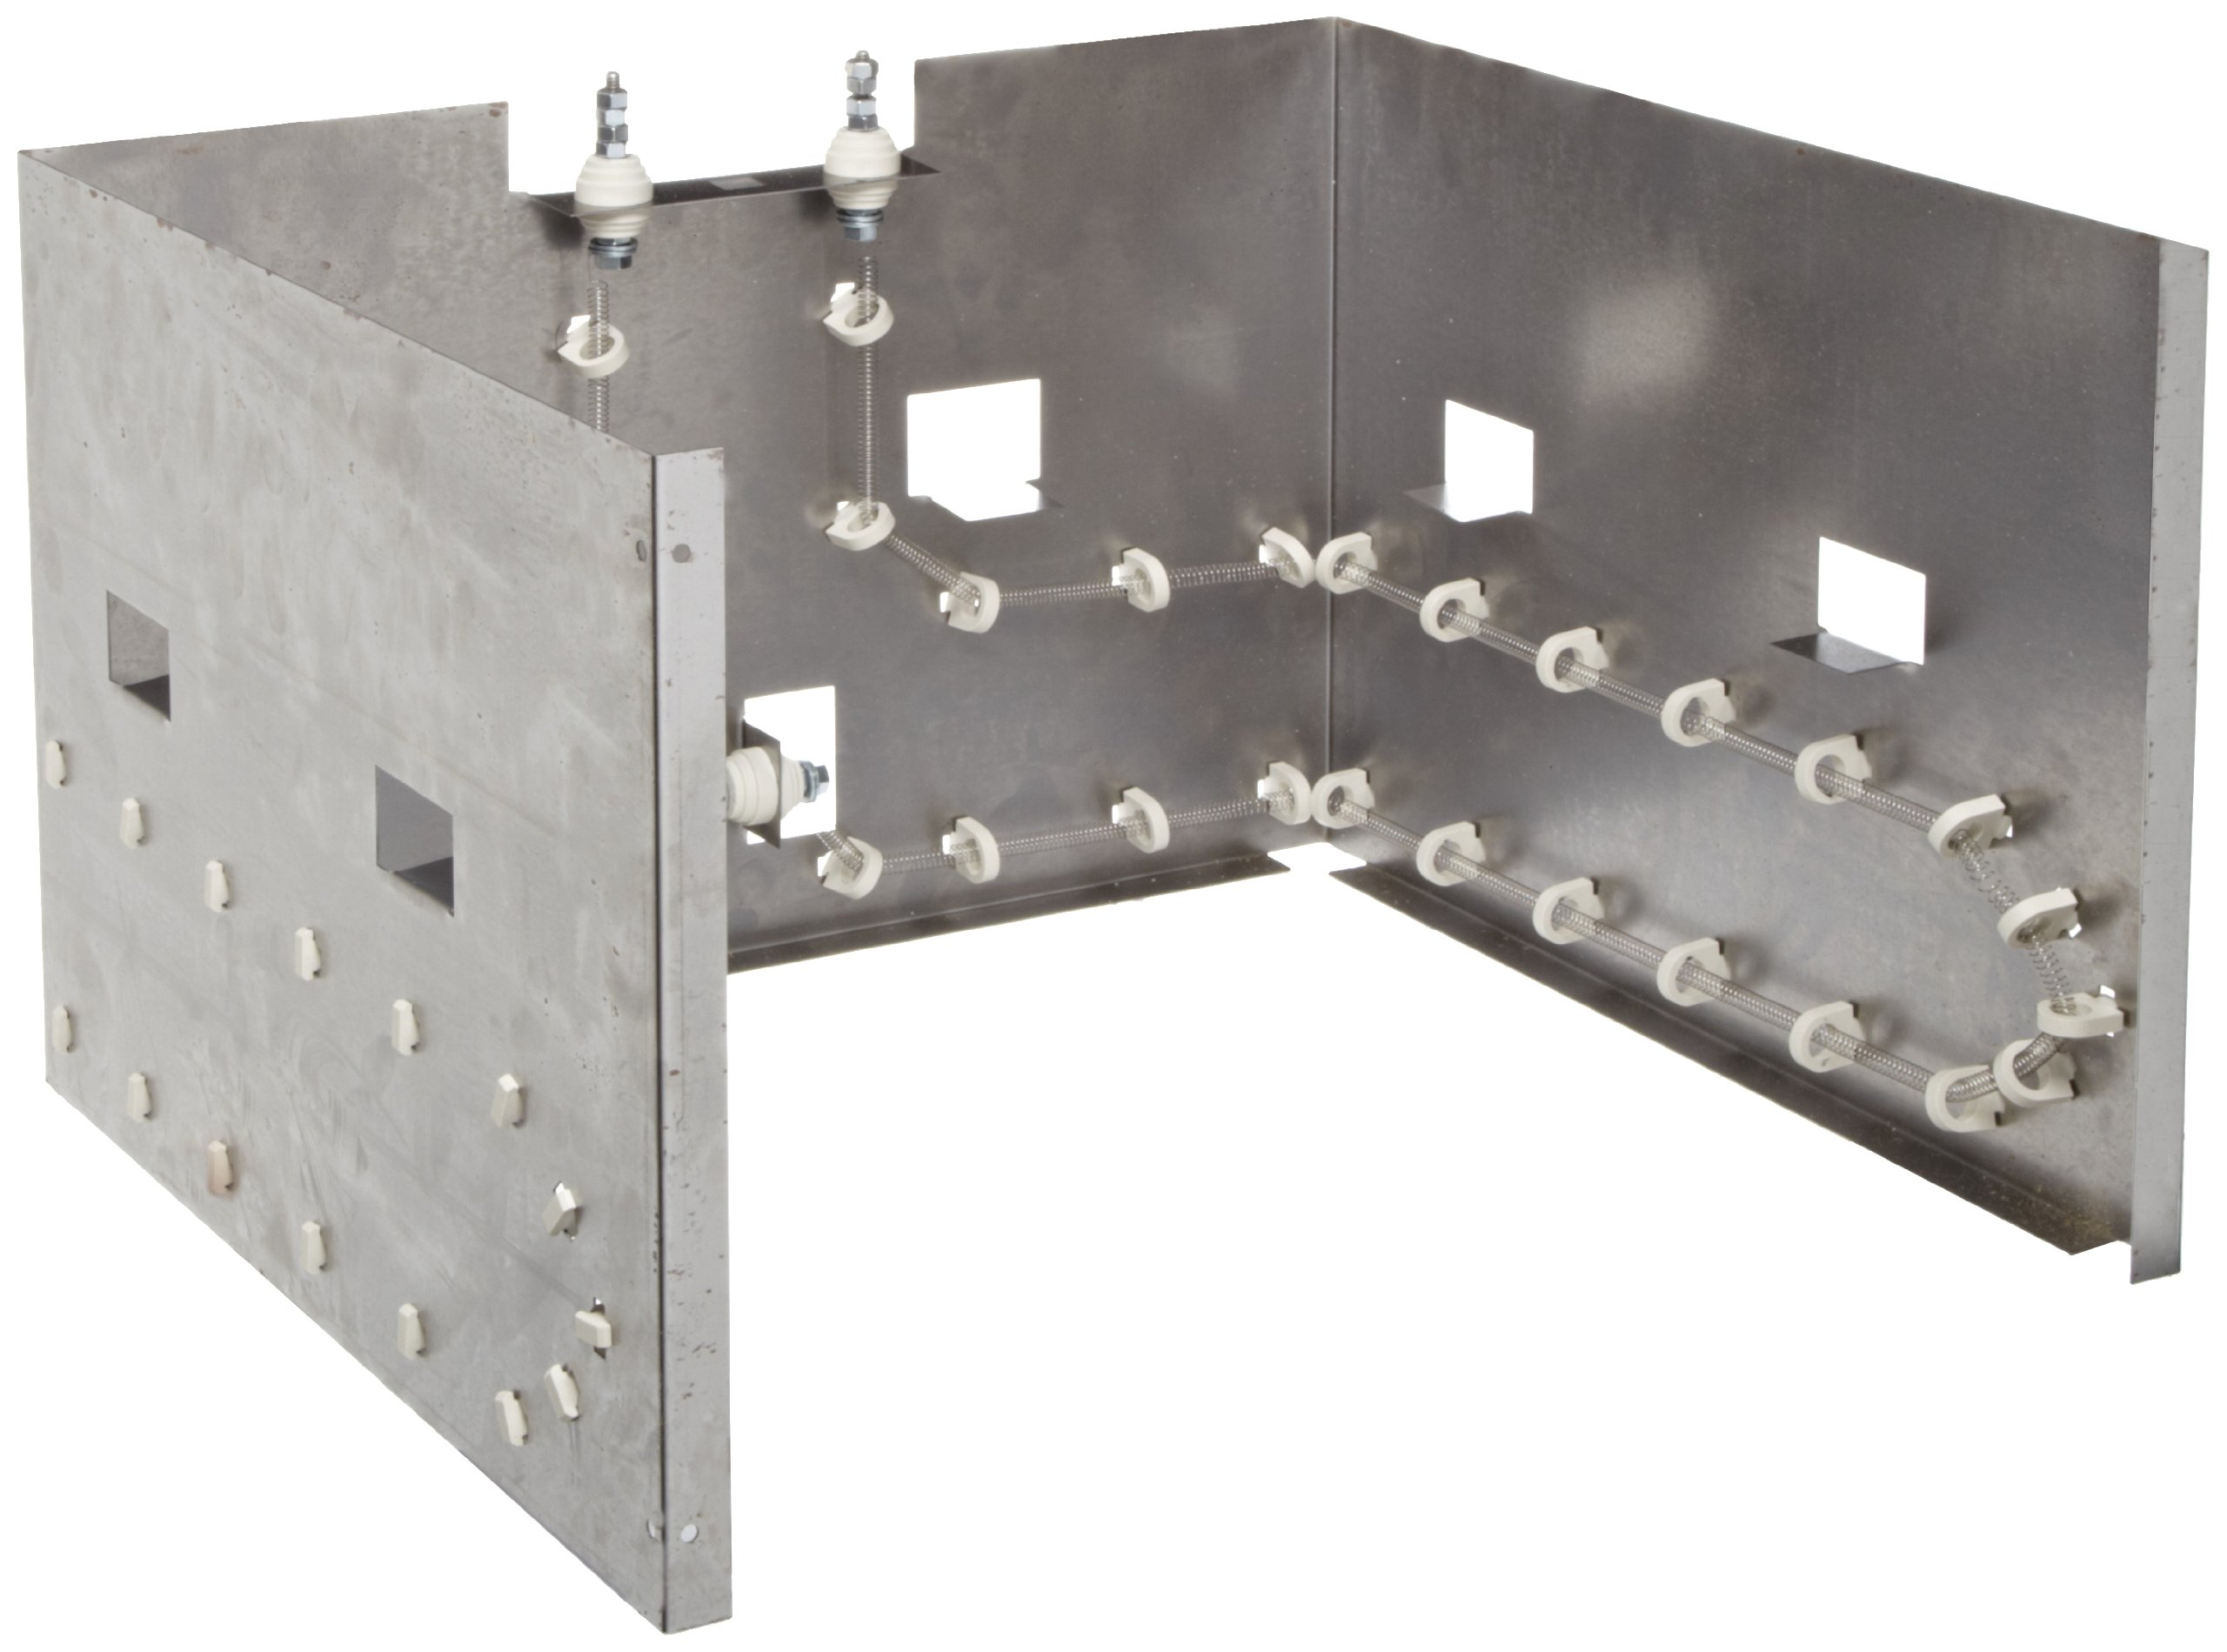 Thomas 9570501 Element Assembly TSINC2, 220V